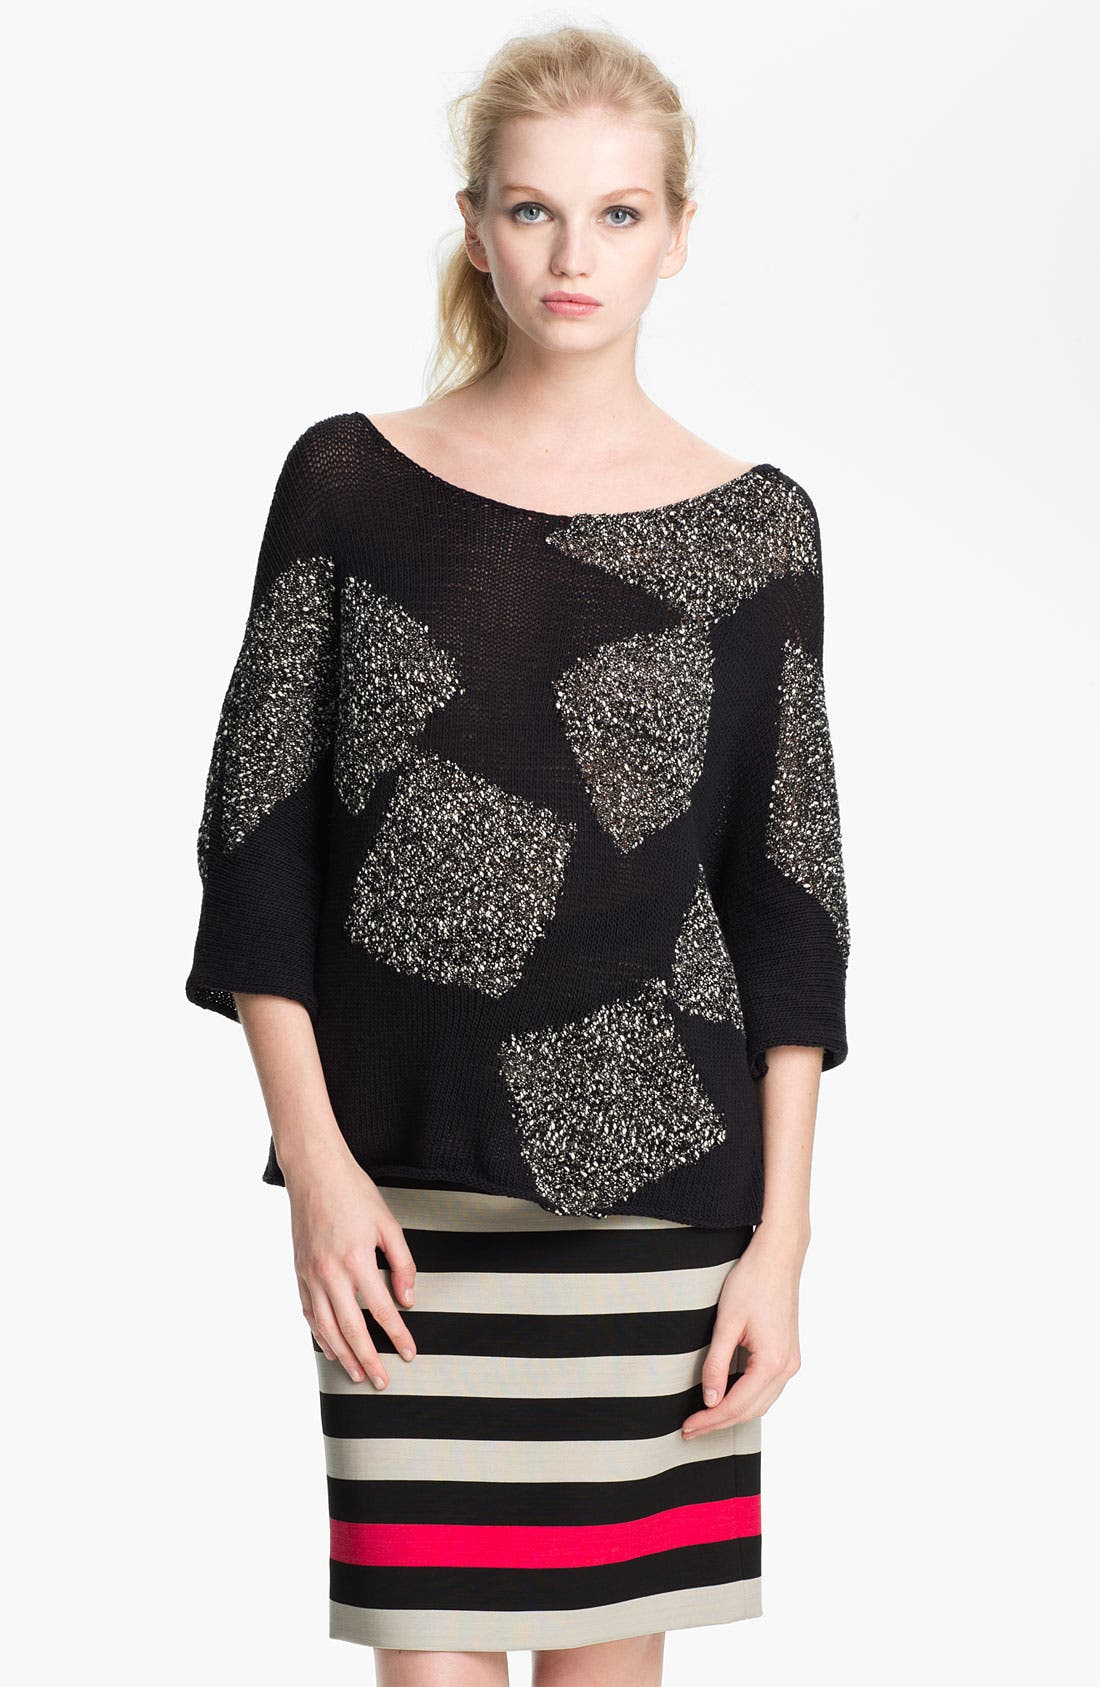 Alternate Image 1 Selected - Diane von Furstenberg 'Zita' Intarsia Sweater